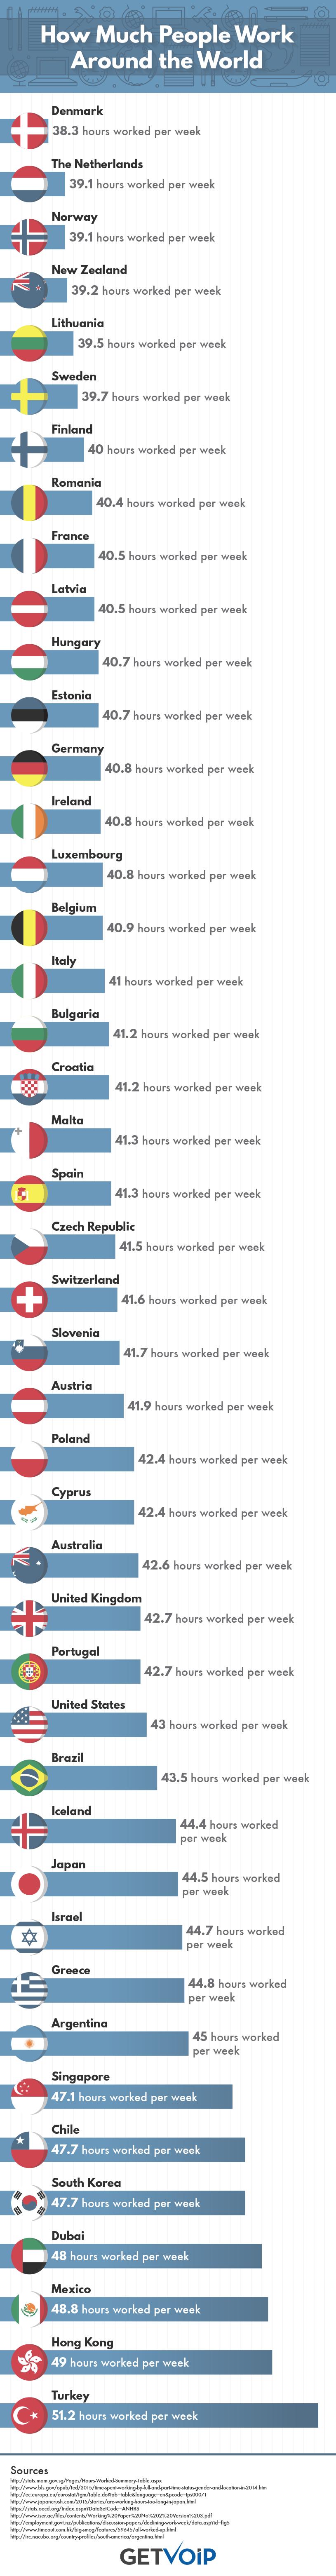 Which Countries Work The Longest Hours? Horas de Trabajo y productividad (